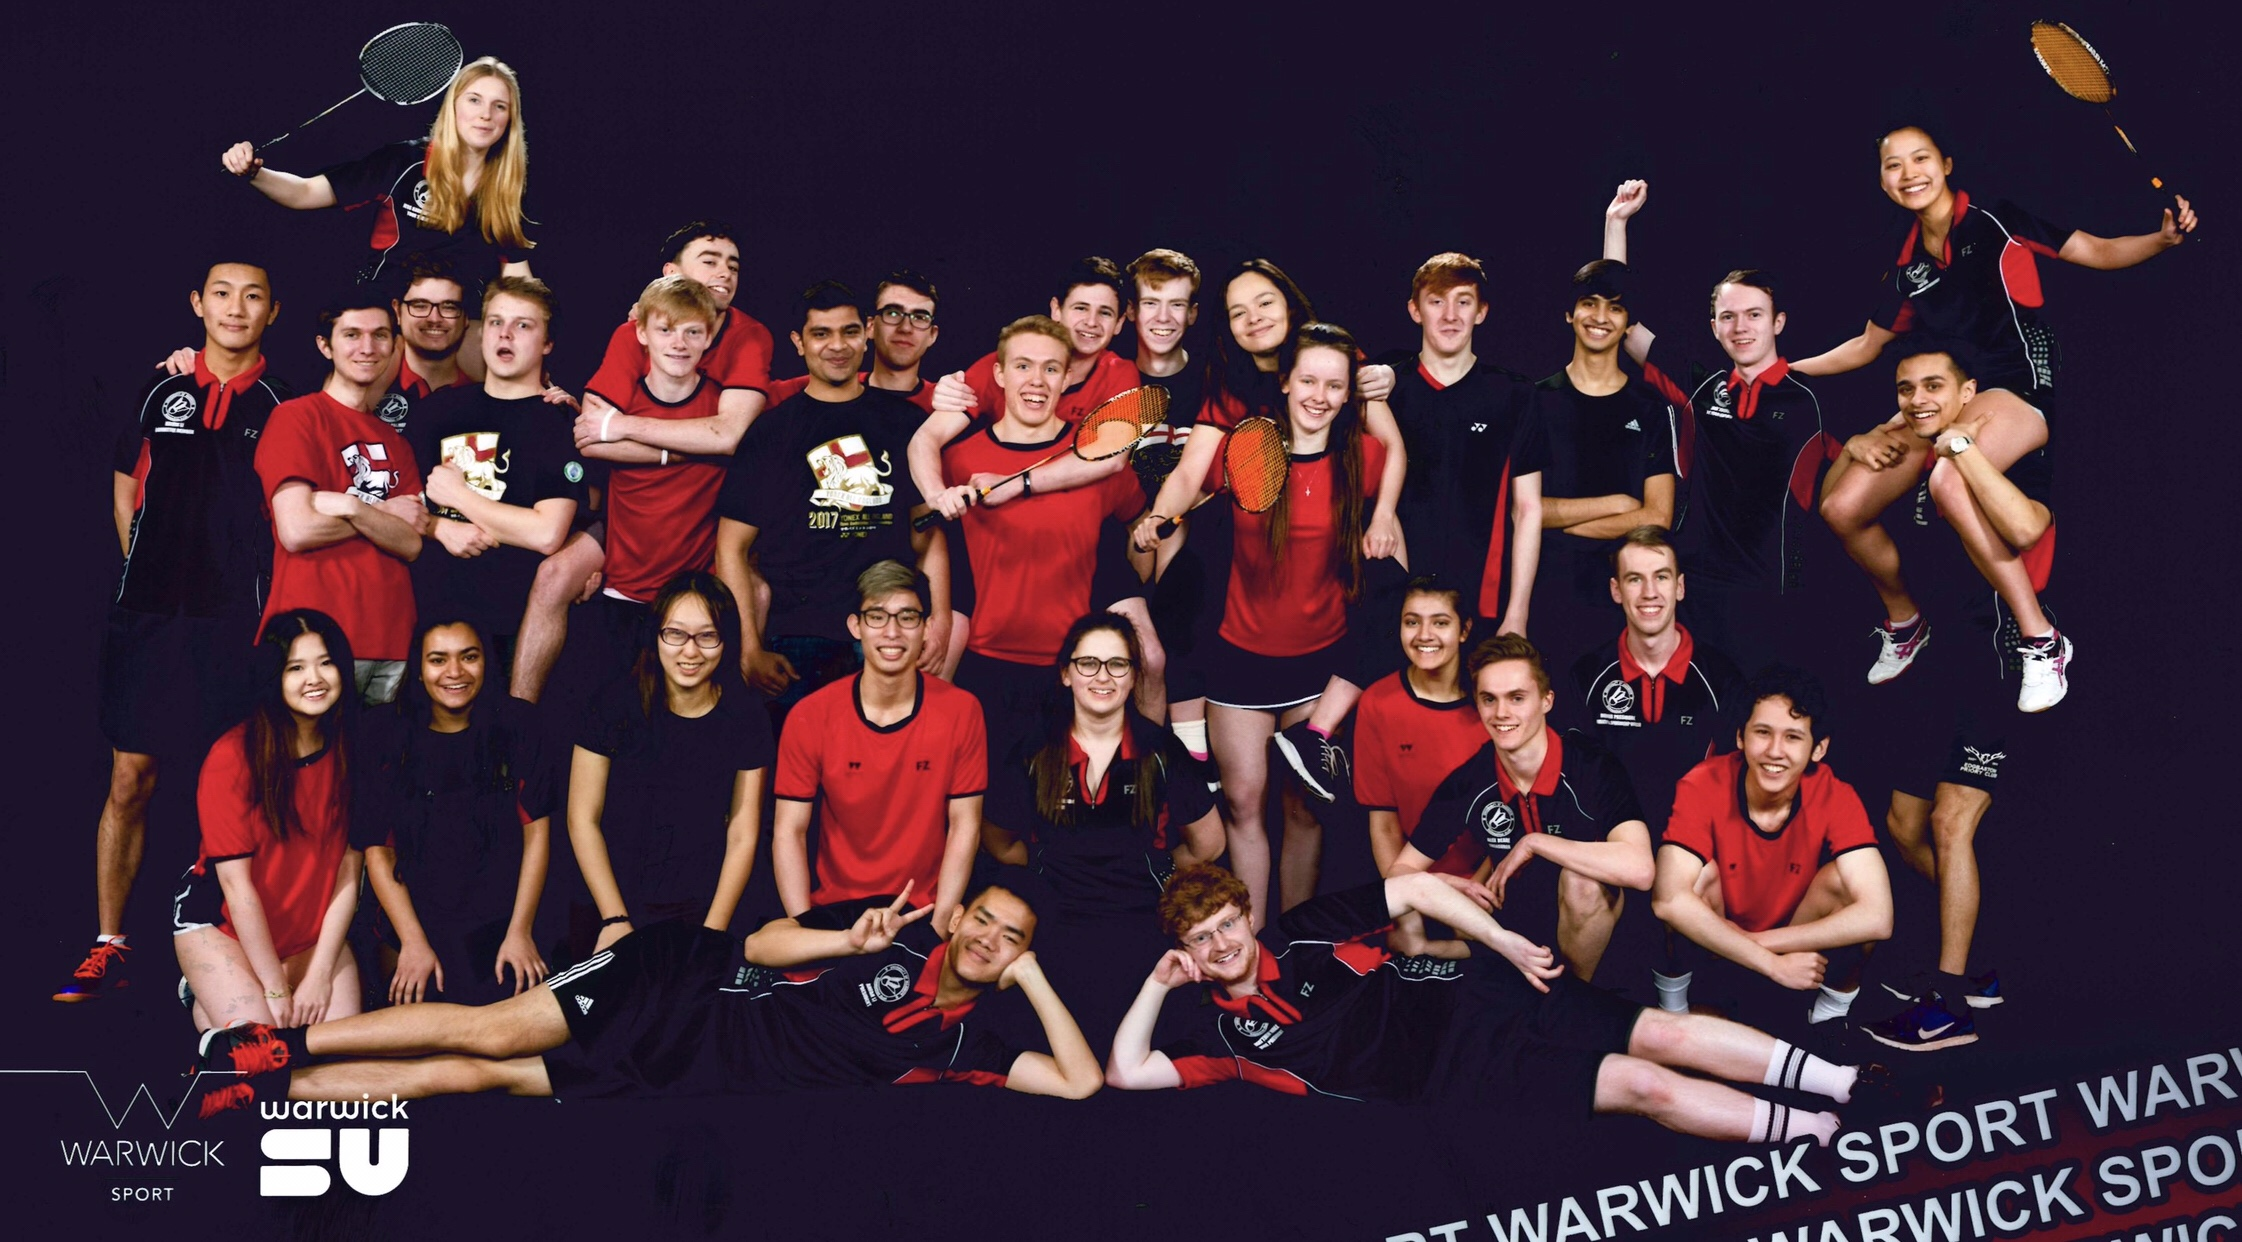 Badminton Club Photo